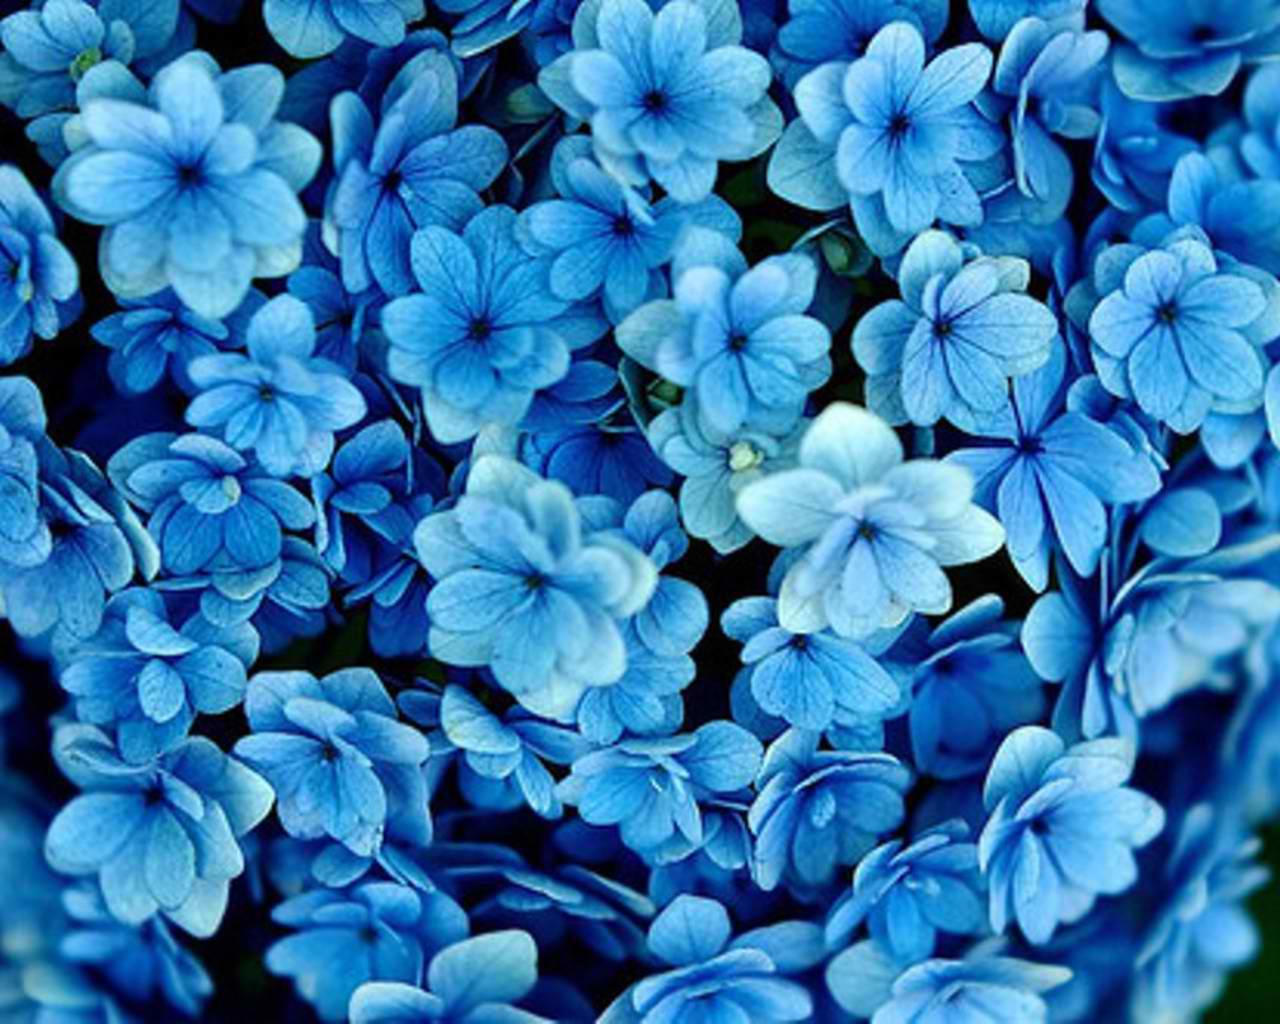 Blue Flowers Wallpaper wallpaper wallpaper hd background desktop 1280x1024